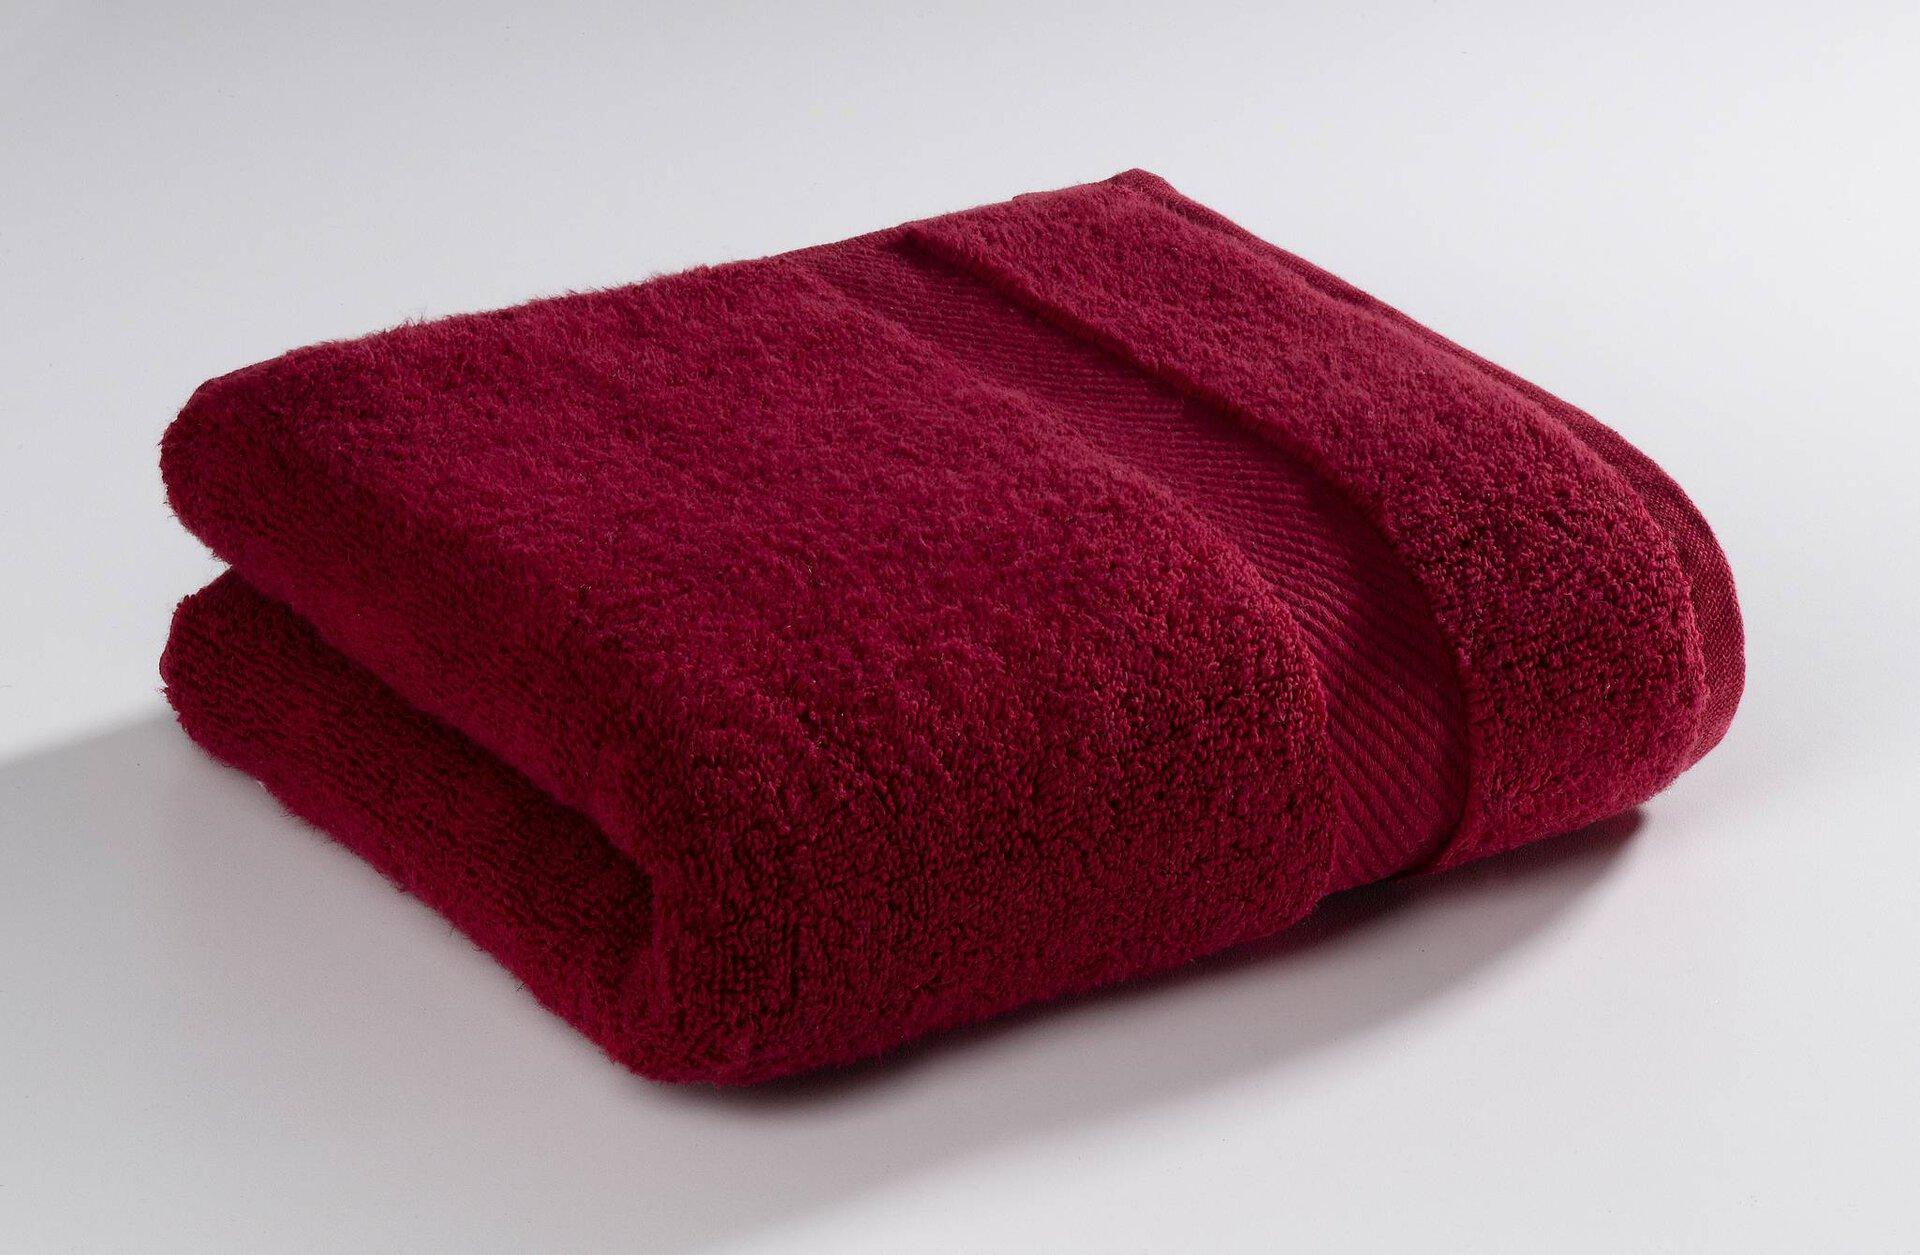 Handtuch Micro Baumwolle Casa Nova Textil 50 x 100 cm